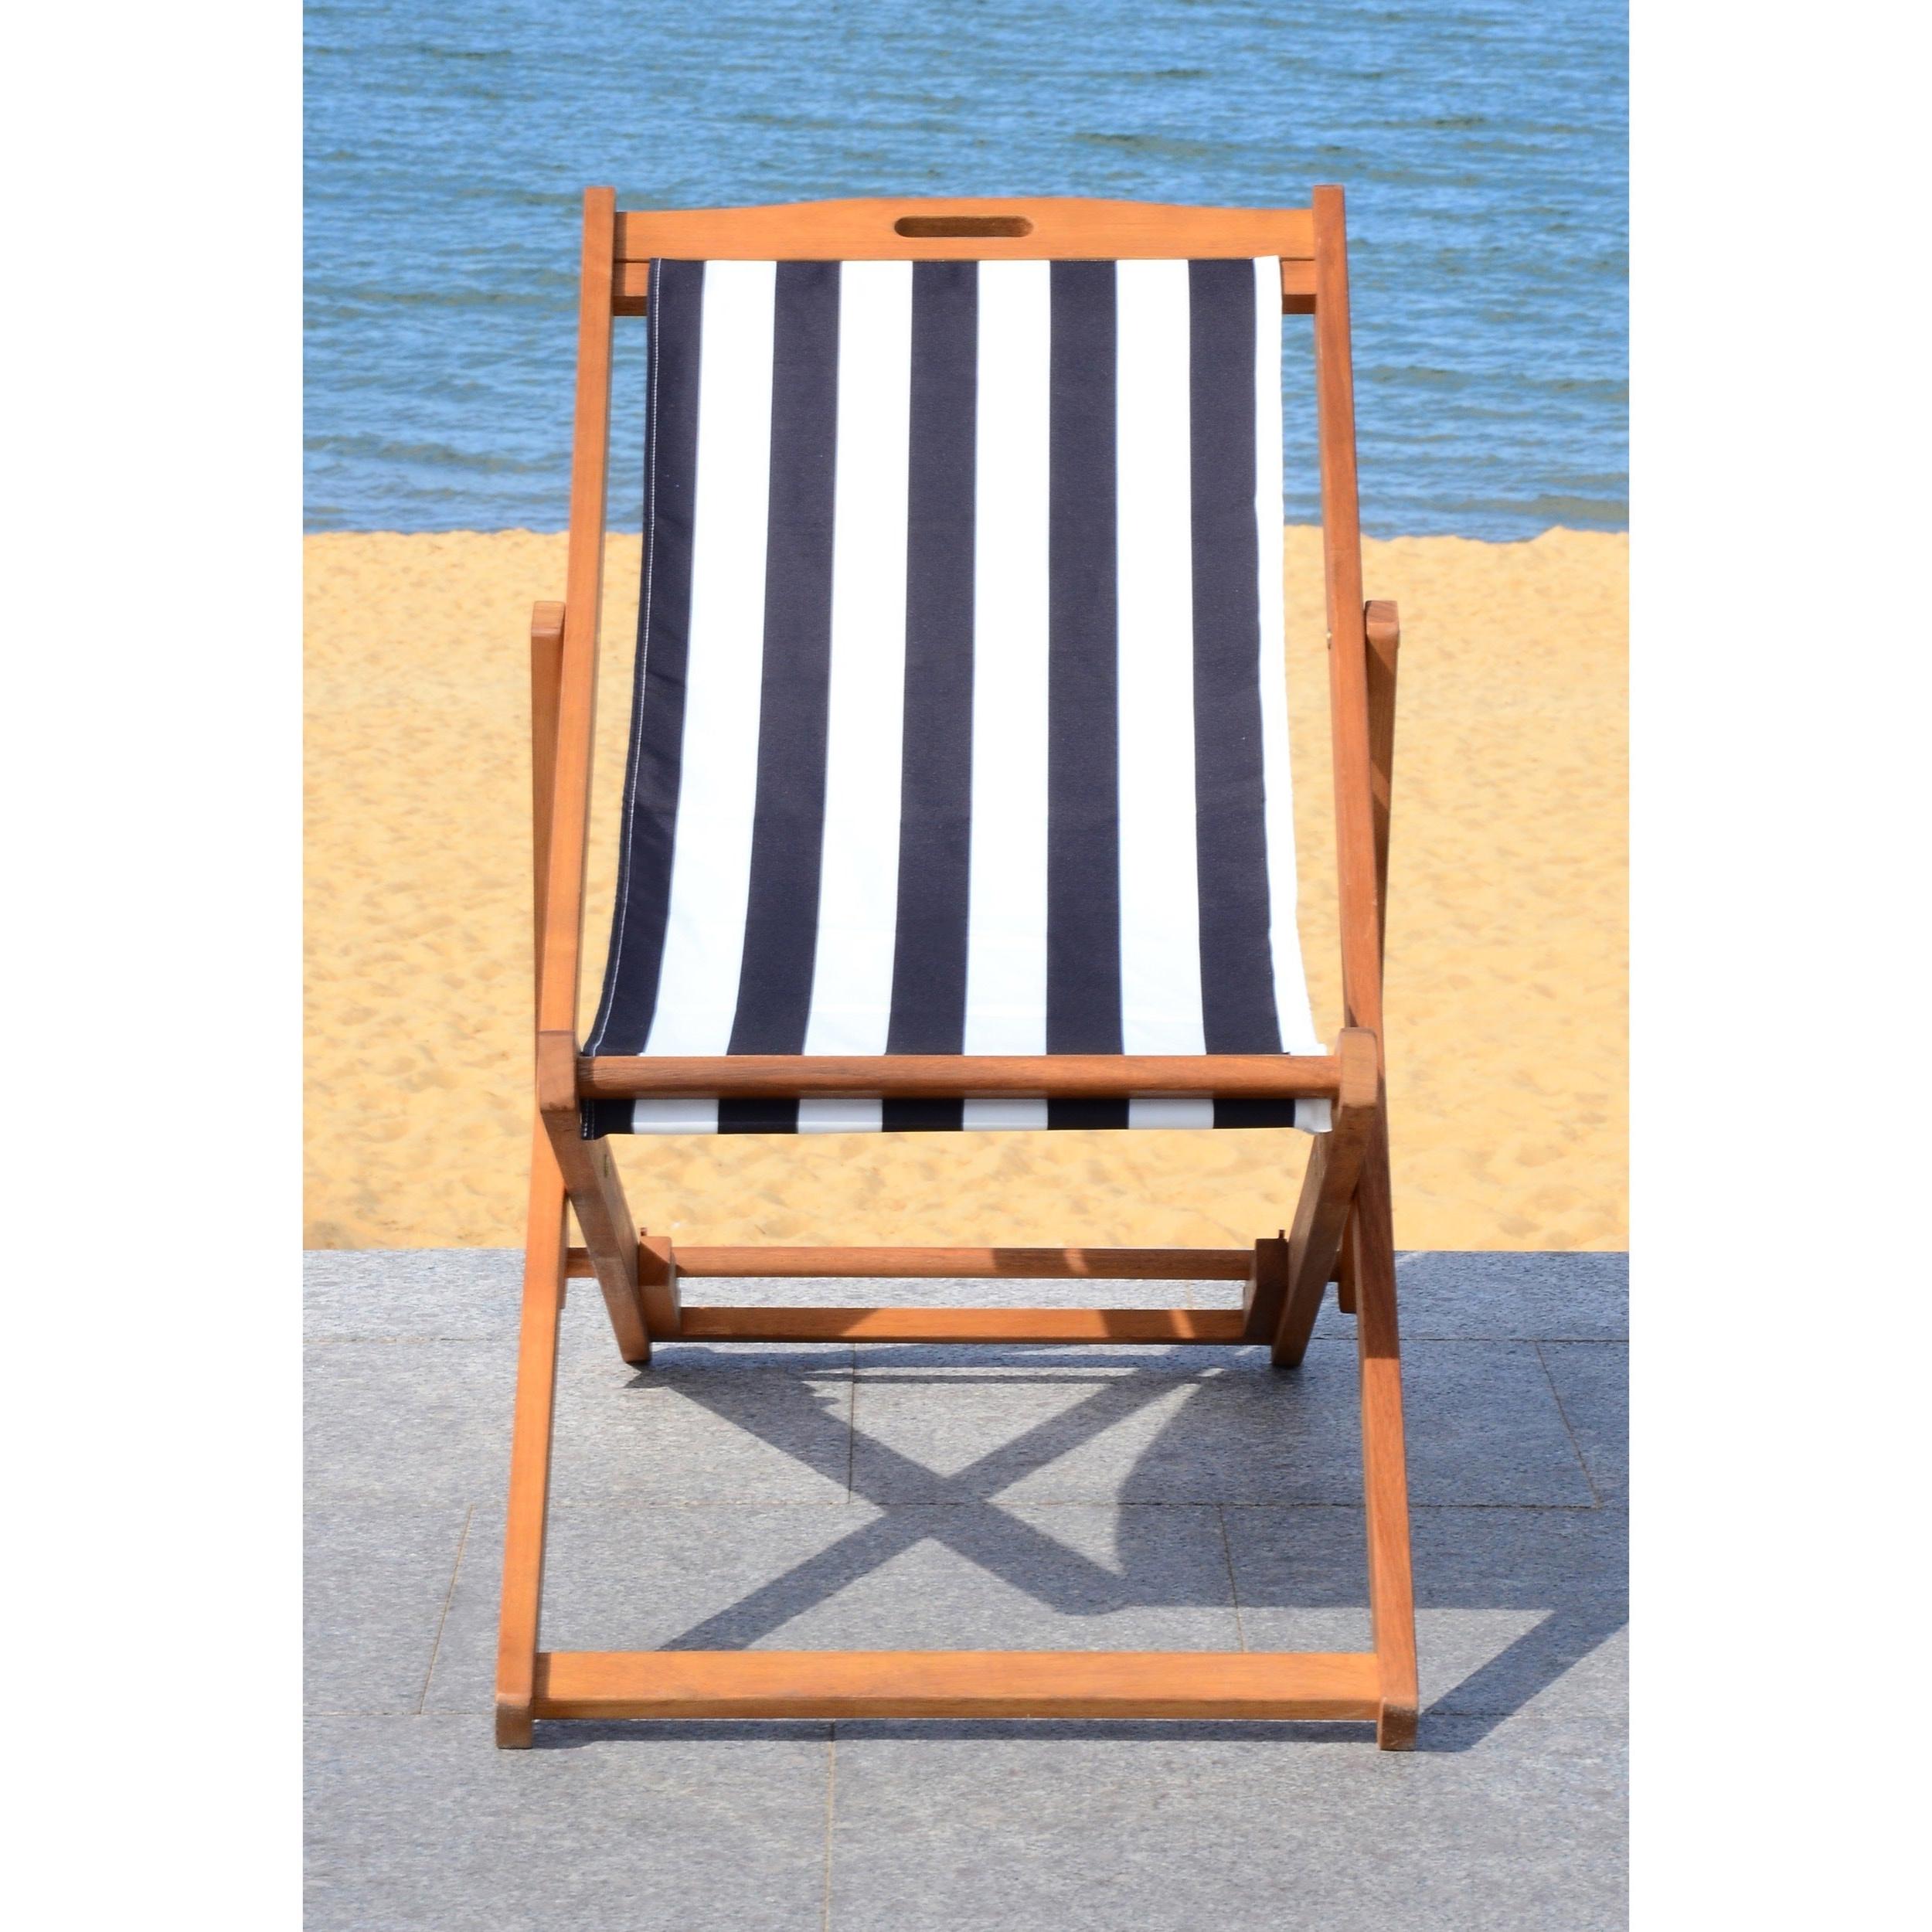 Safavieh Loren Natural/black Foldable Sling Chair Regarding Recent Amazonia Copacabana Wood Swing Chairs (View 11 of 25)